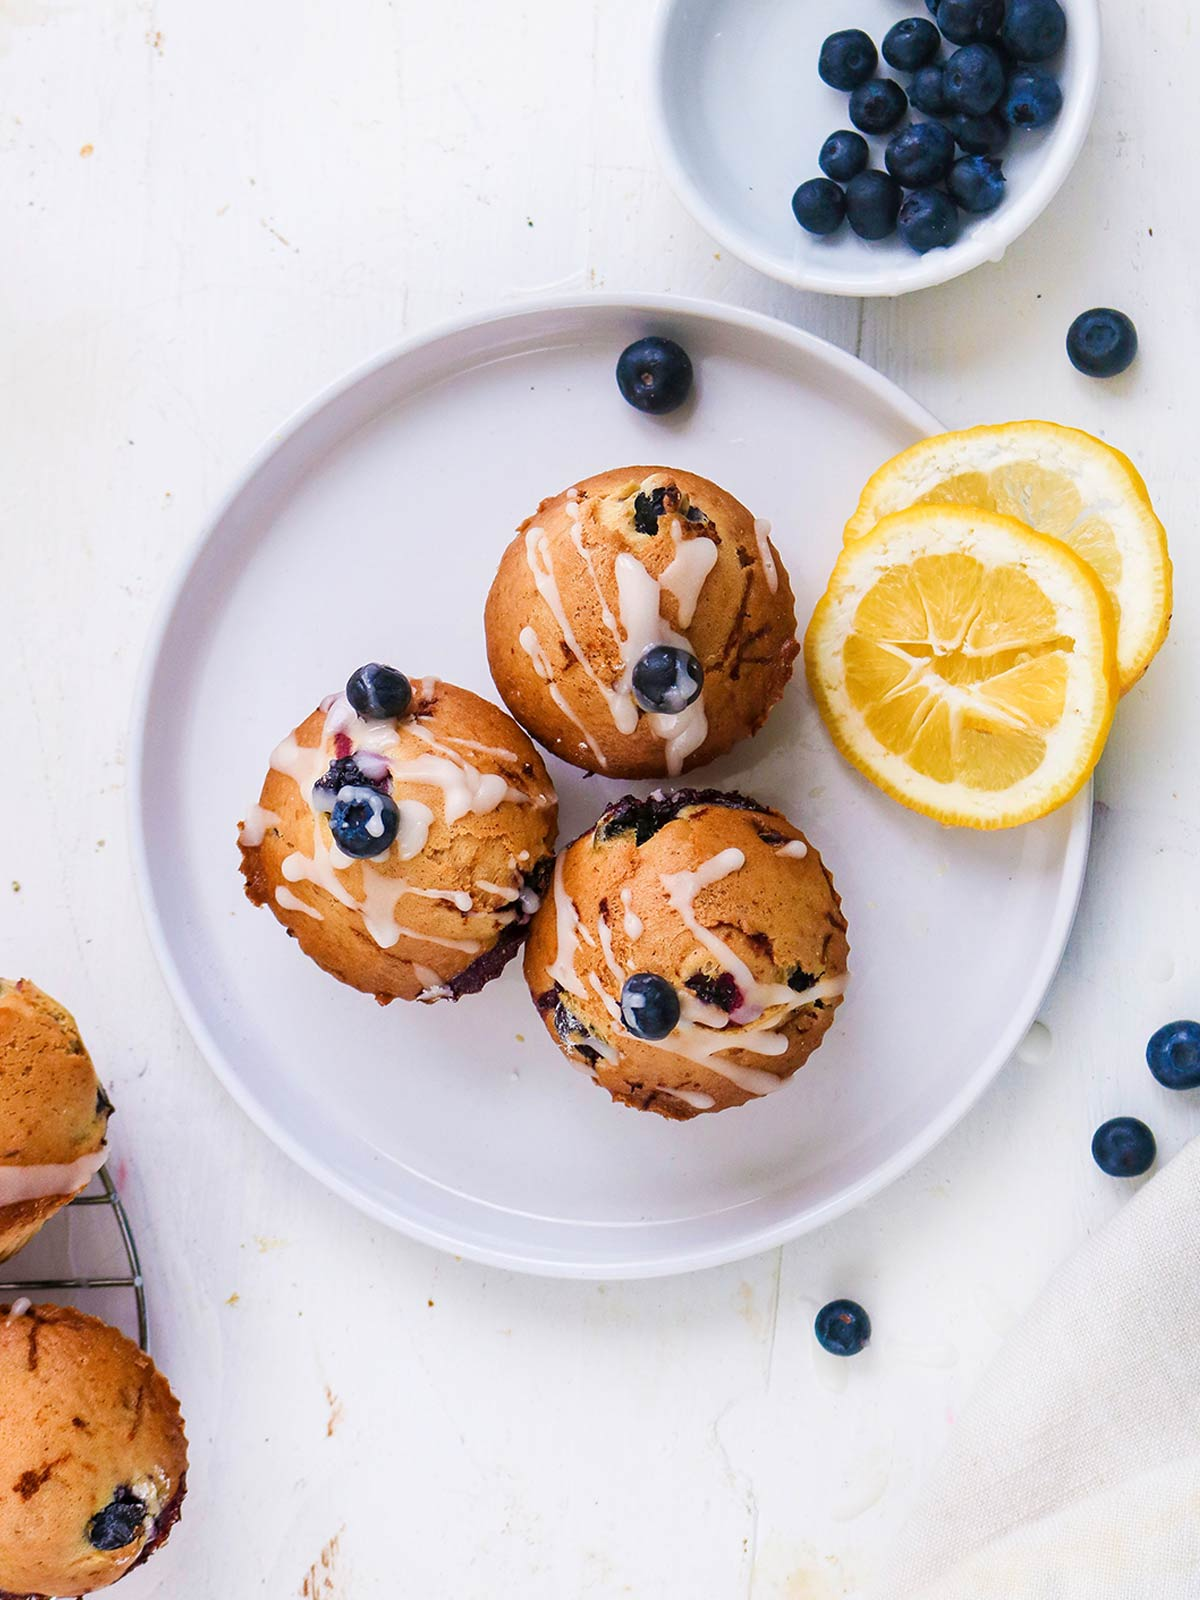 Vegan Blueberry lemon muffins served on top with lemon slices on side.